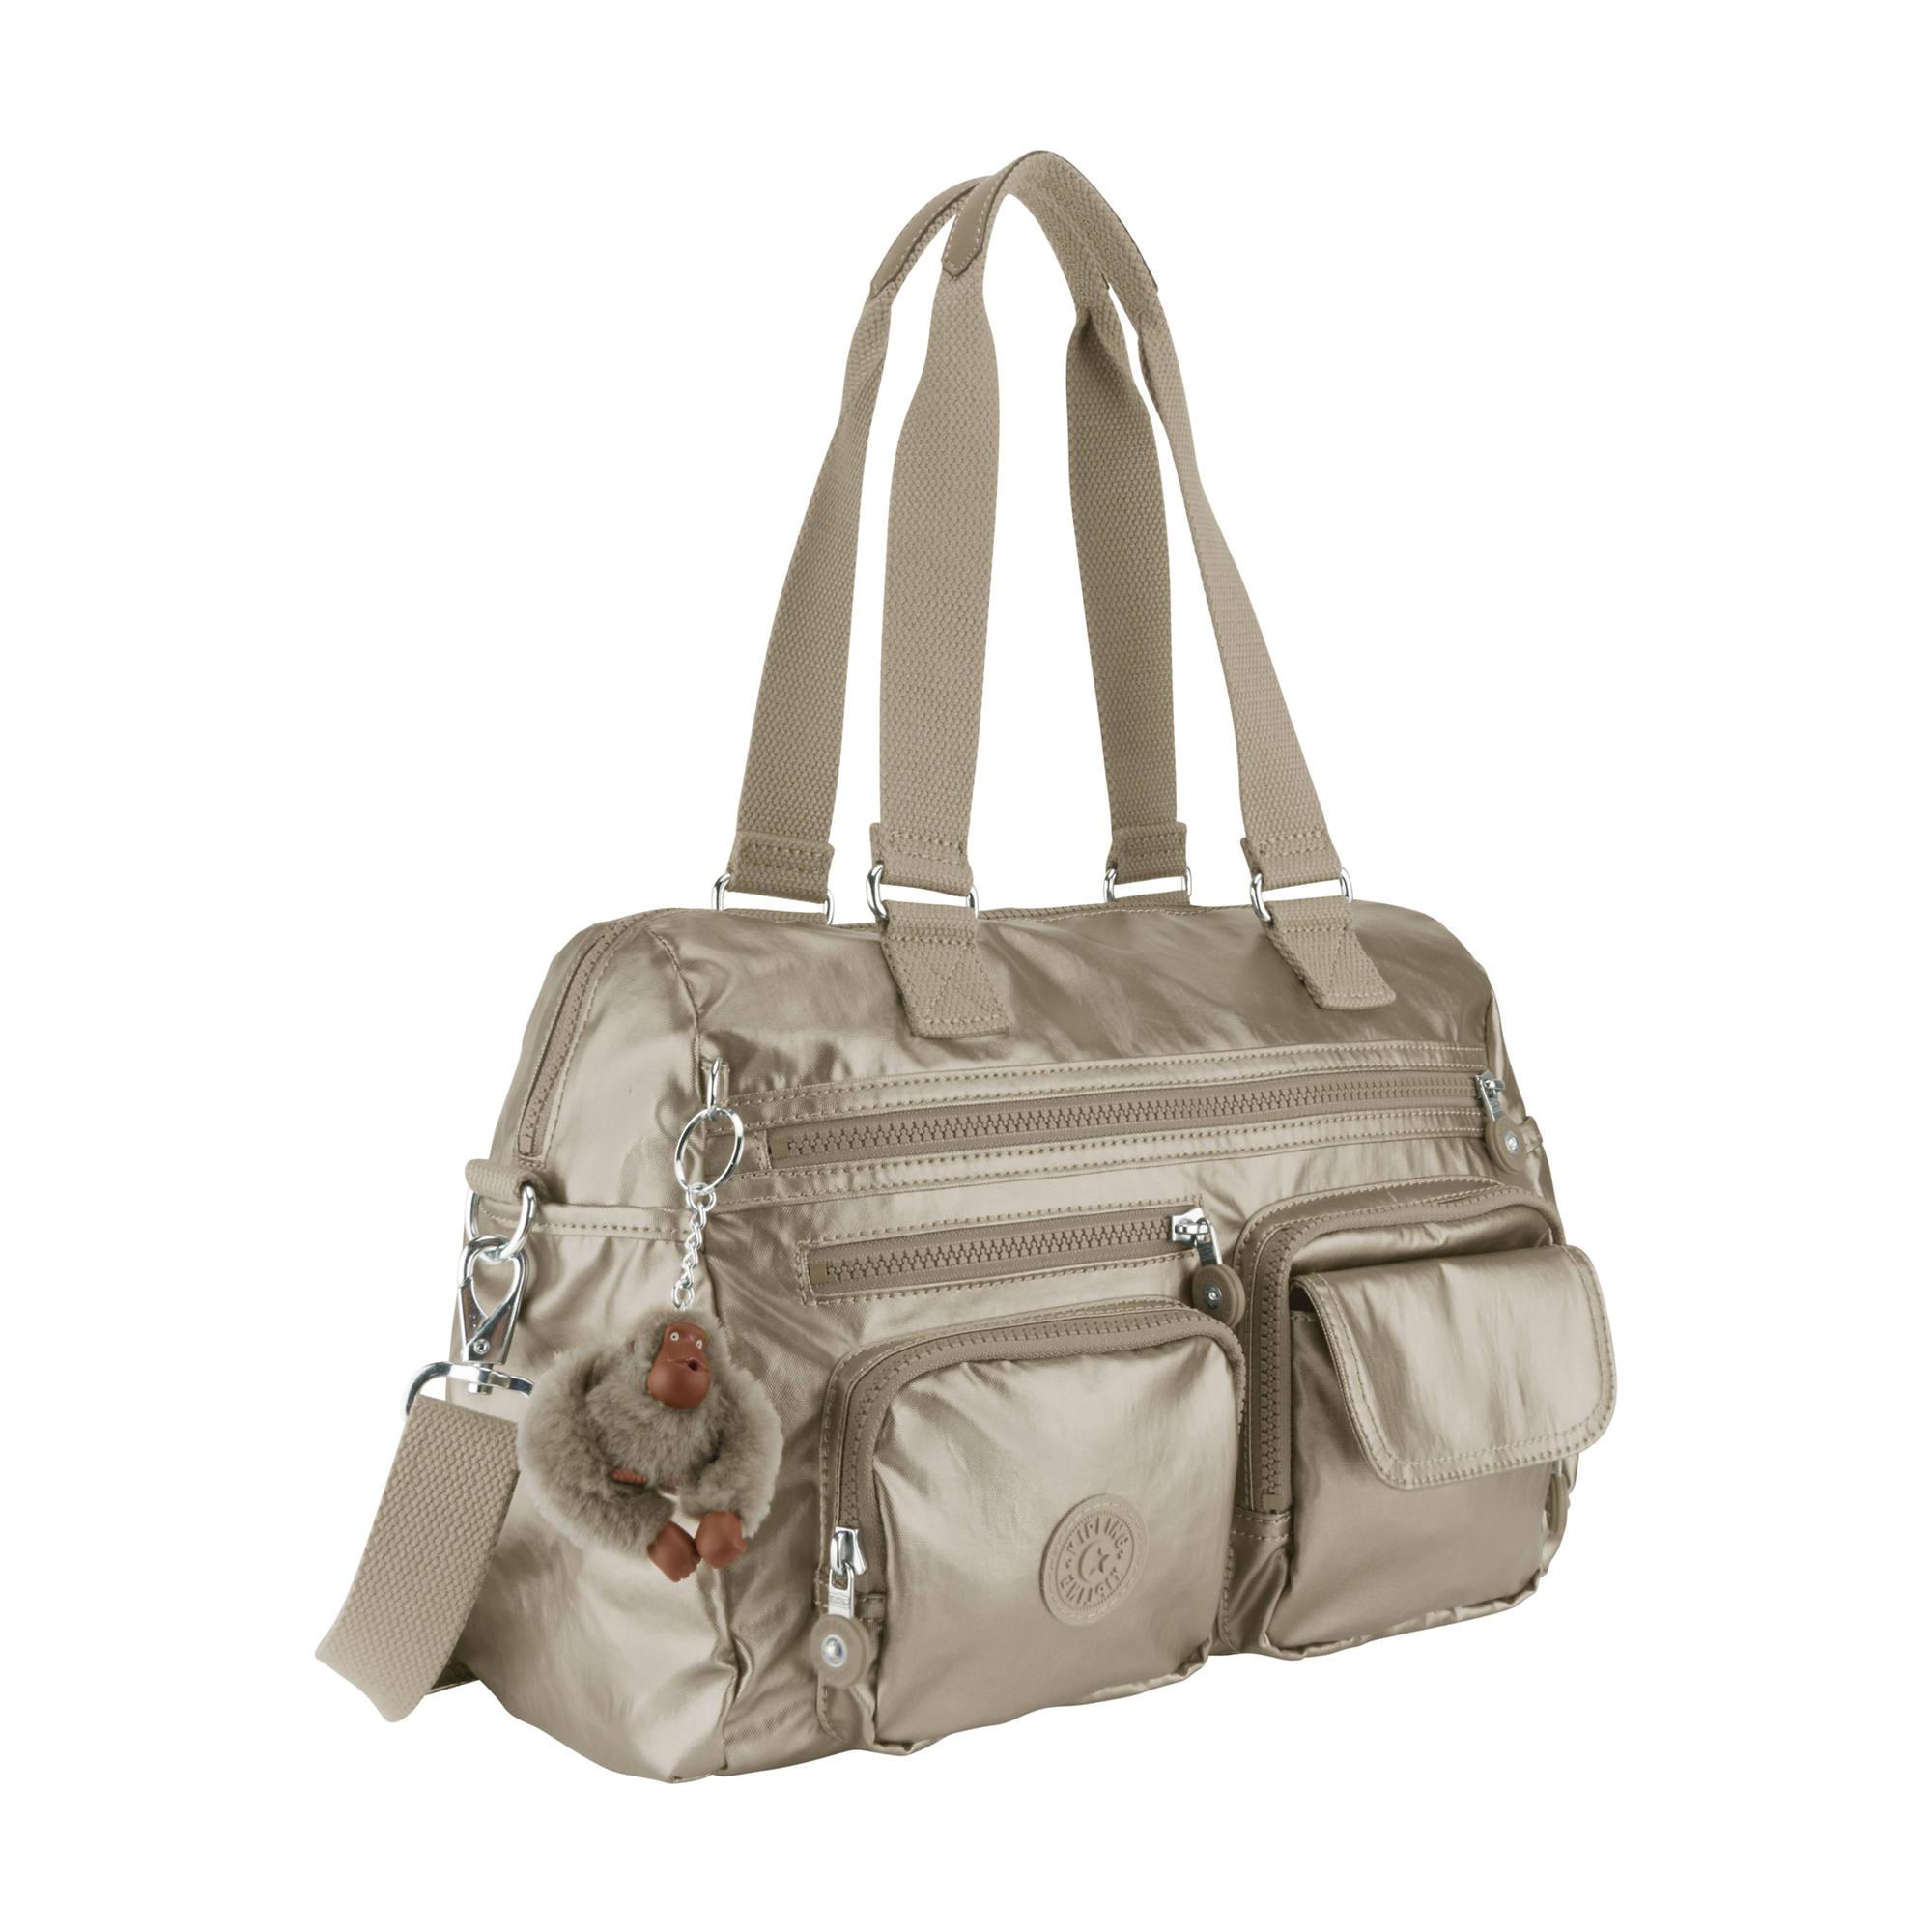 Mara Metallic Handbag Kipling